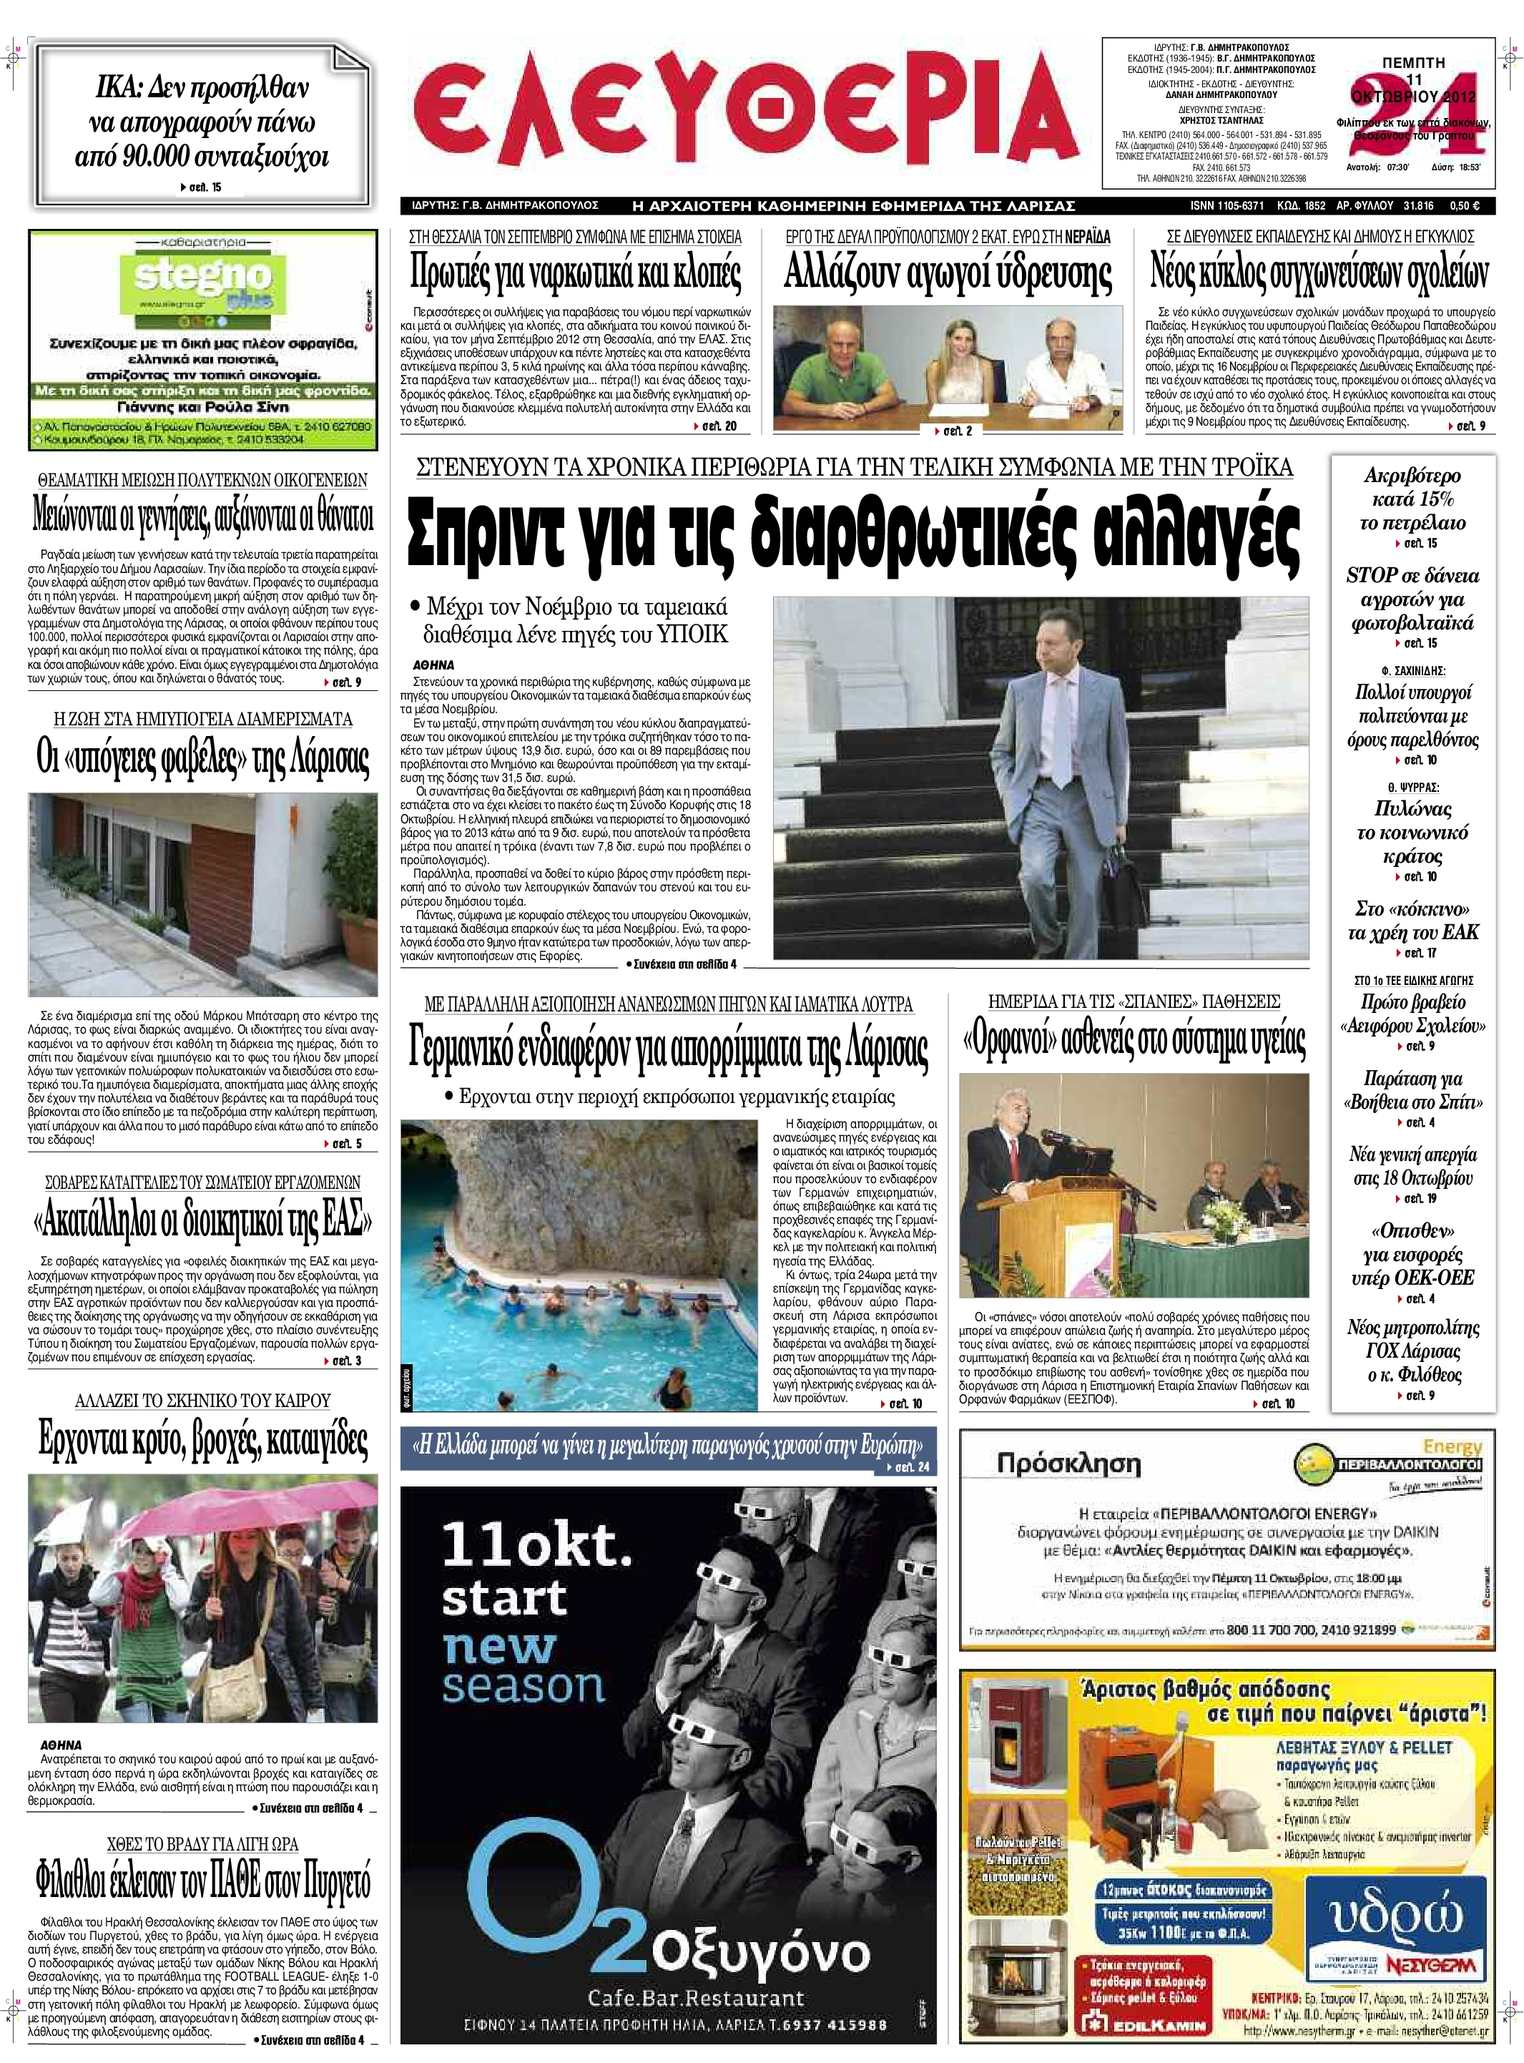 Calaméo - Eleftheria.gr 11 10 2012 d62bb1bbfb4